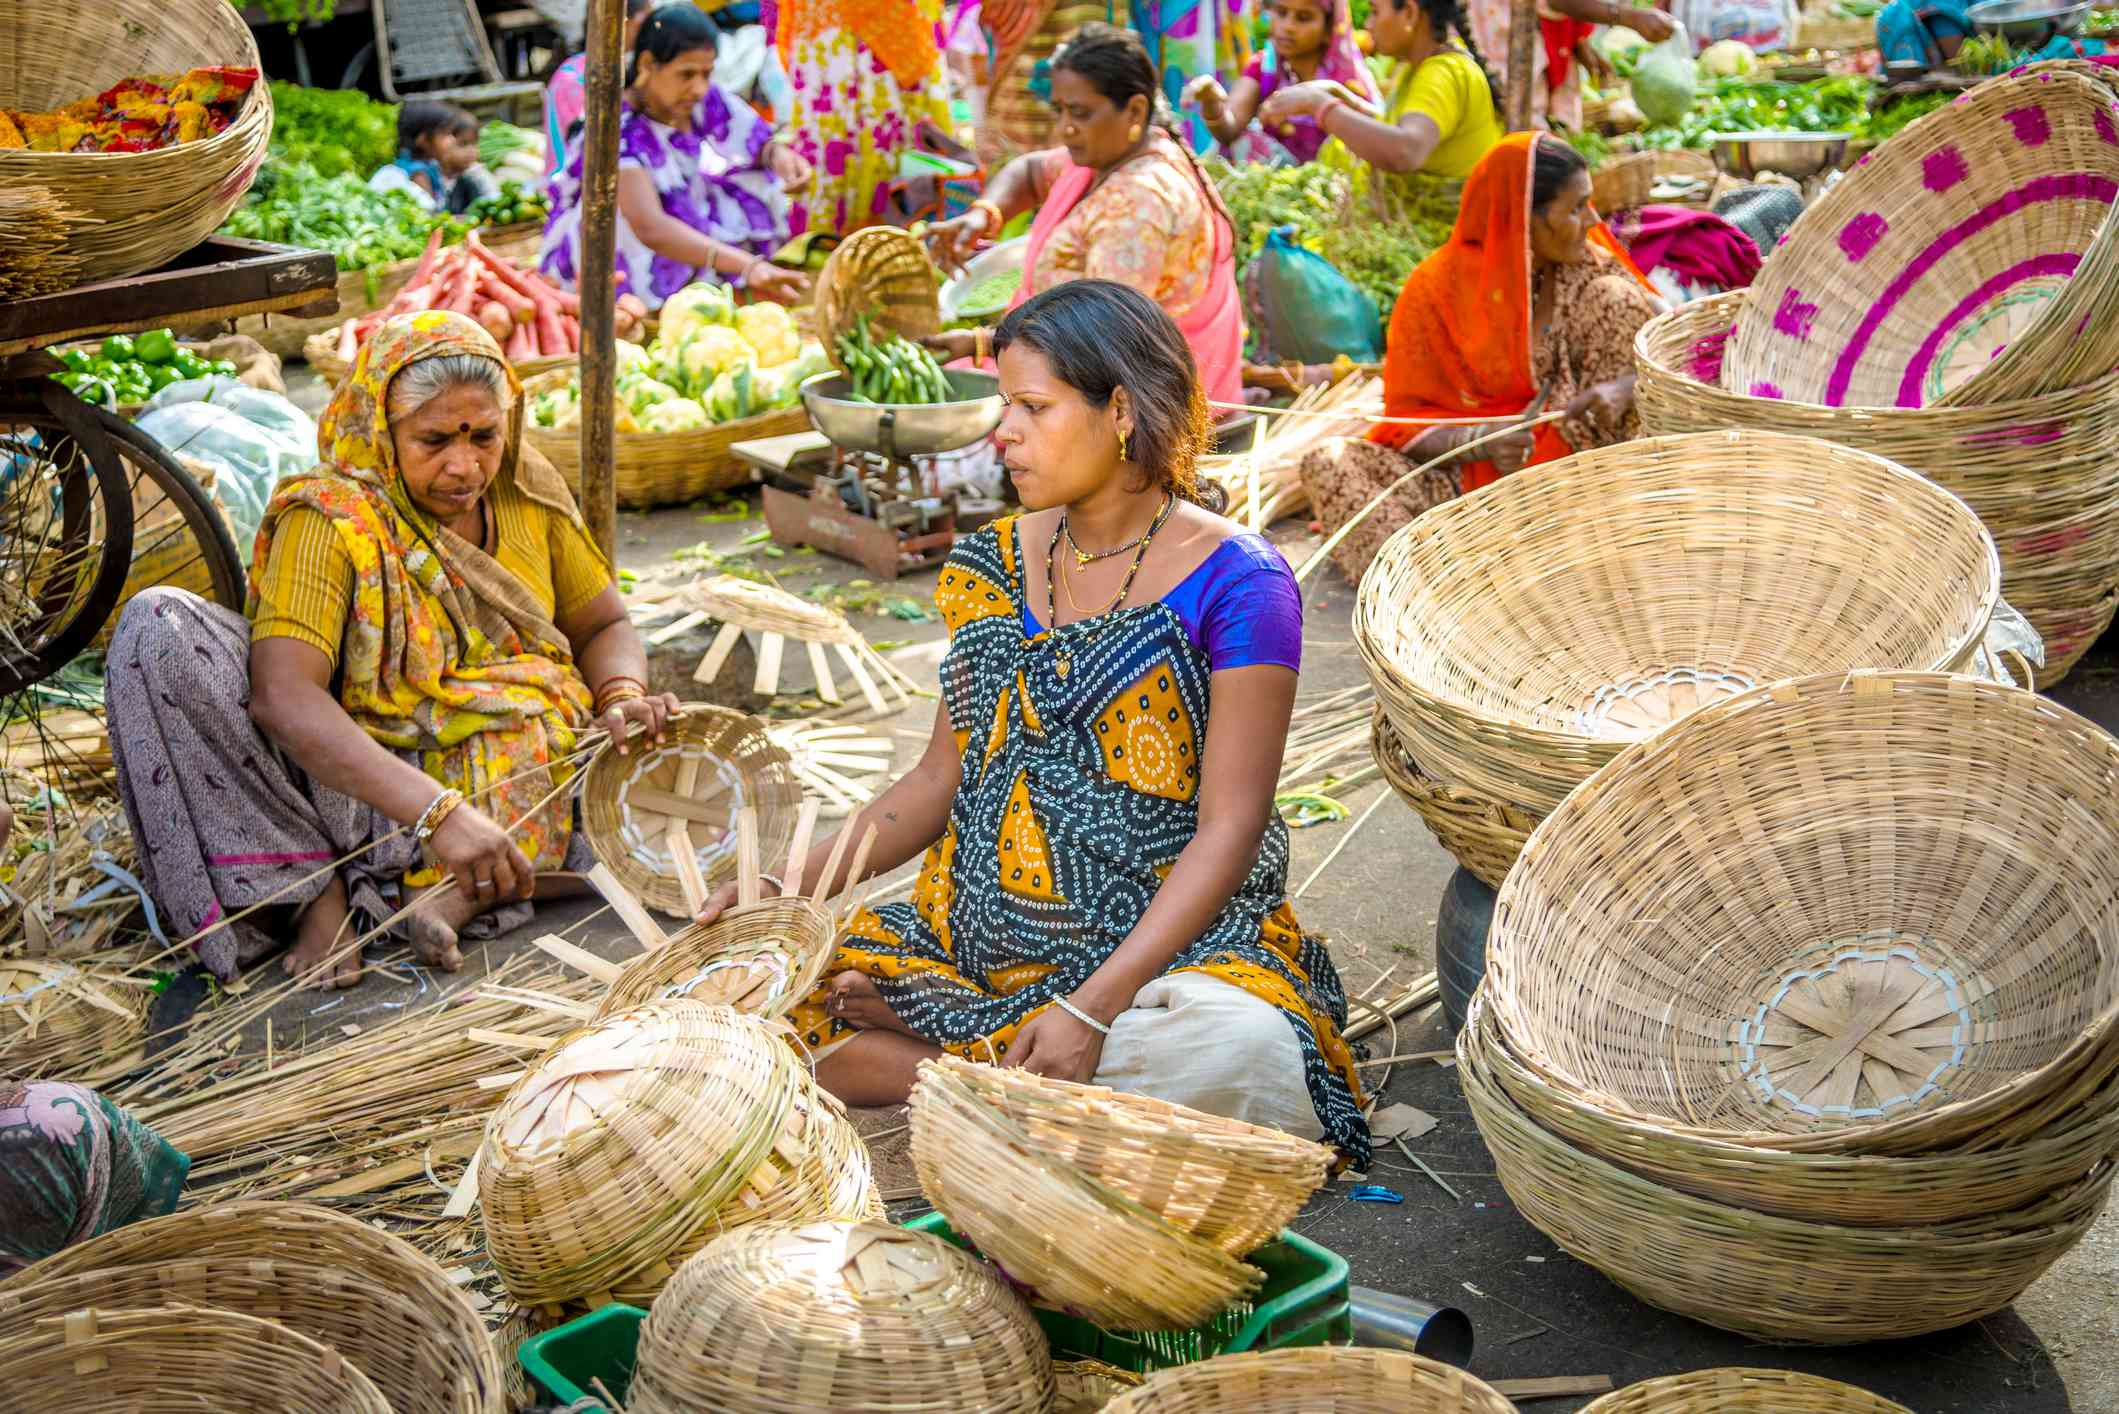 Udaipur basket and vegetable sellers.